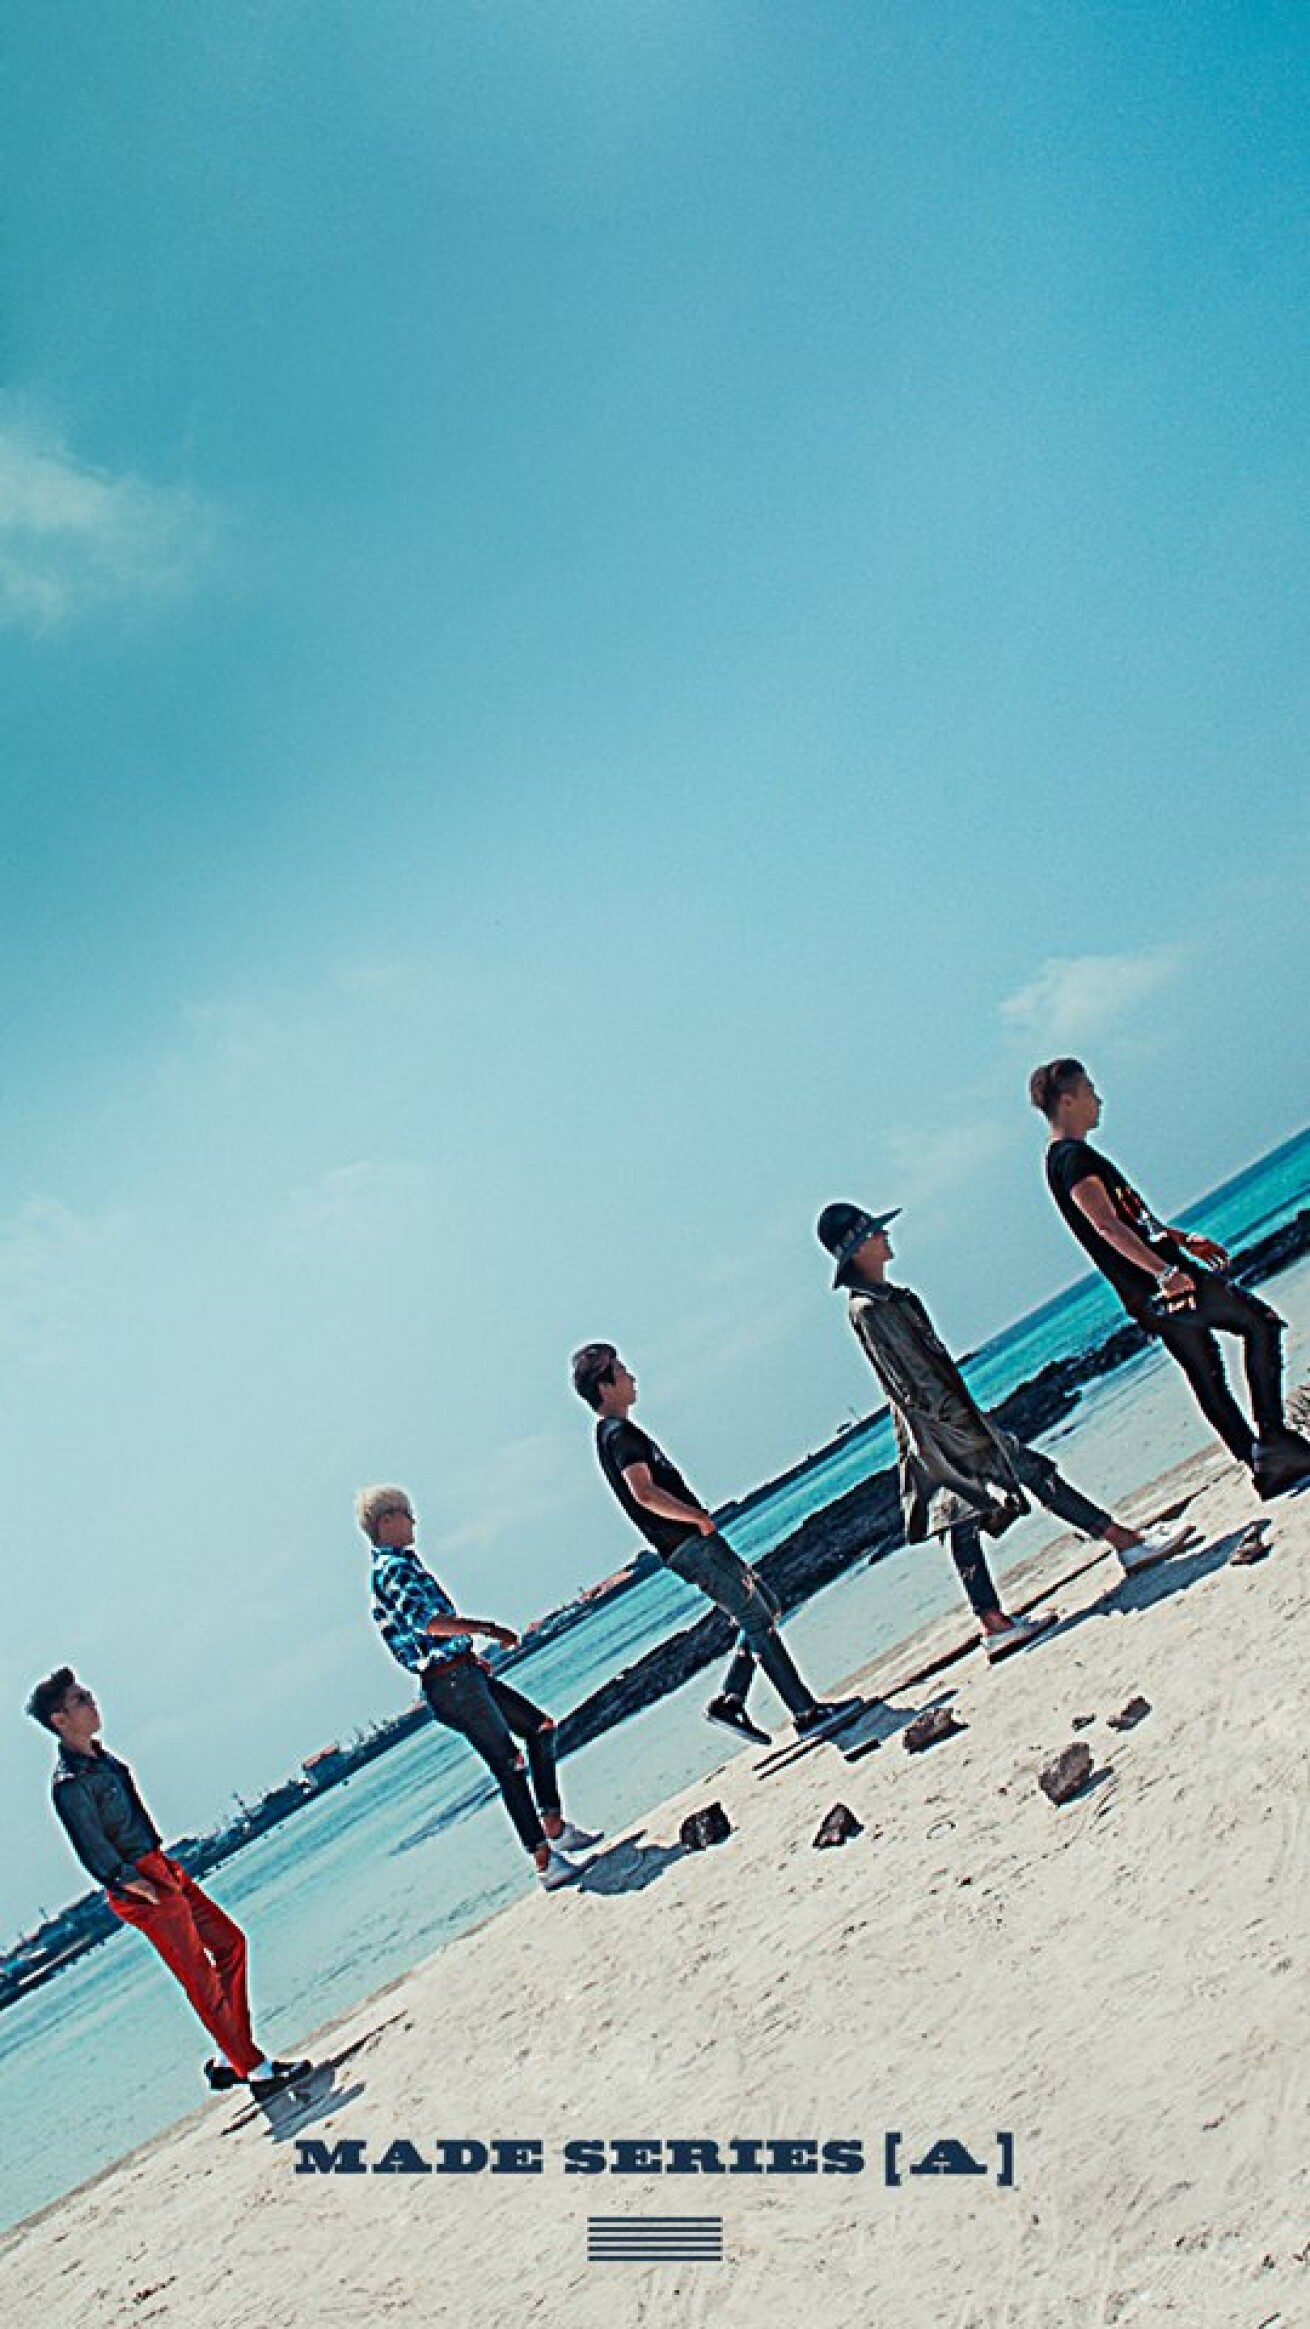 Iflyer Bigbang 新曲 We Like 2 Party のミュージックビデオを公開